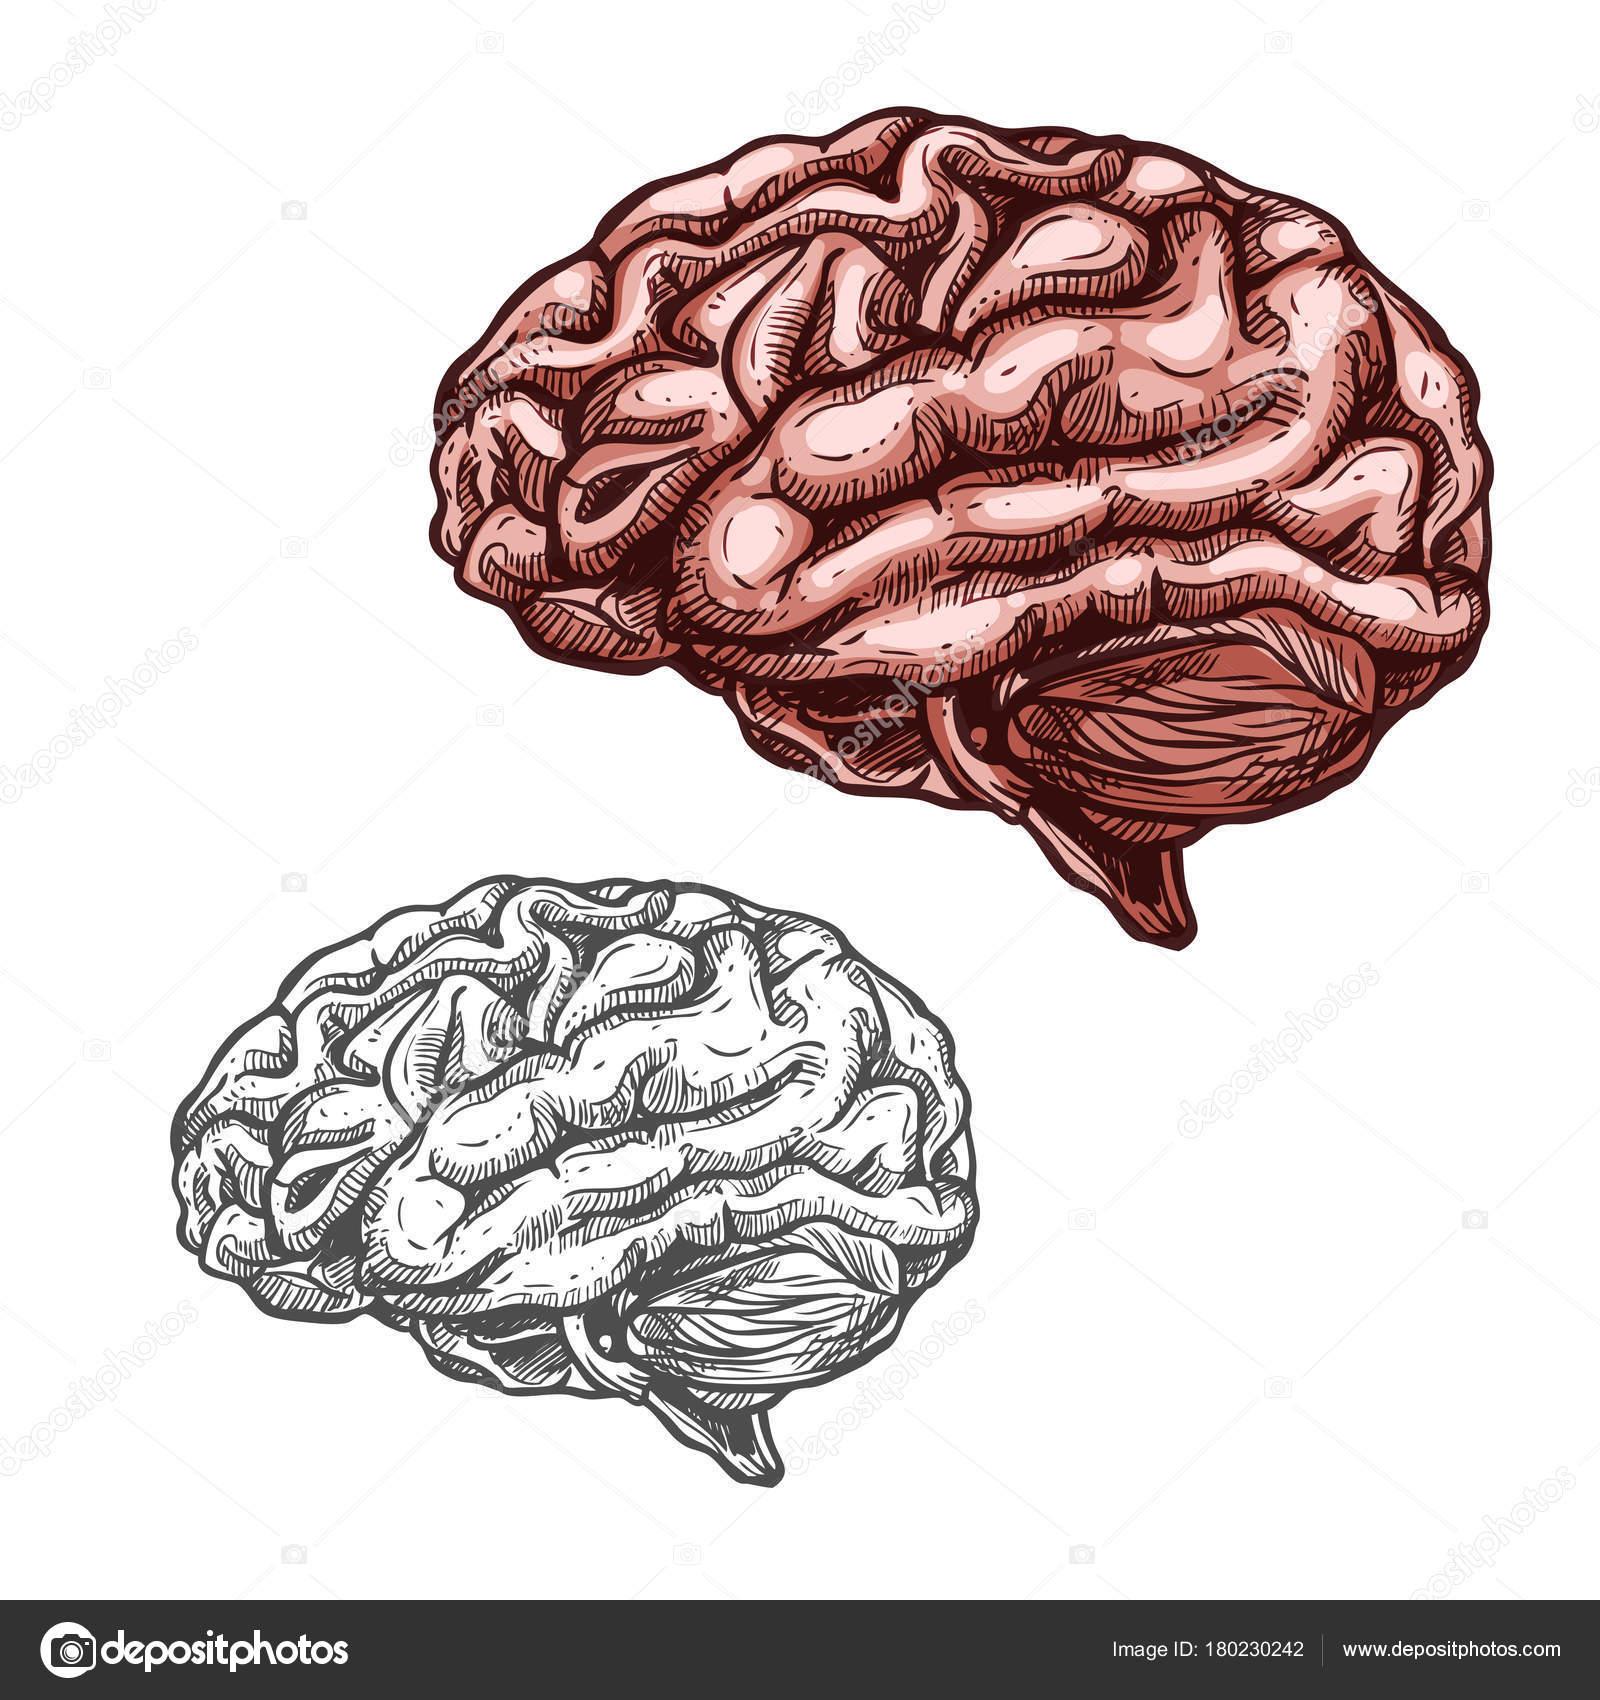 Menschliches Organ Gehirn Vektor Skizzensymbol — Stockvektor ...